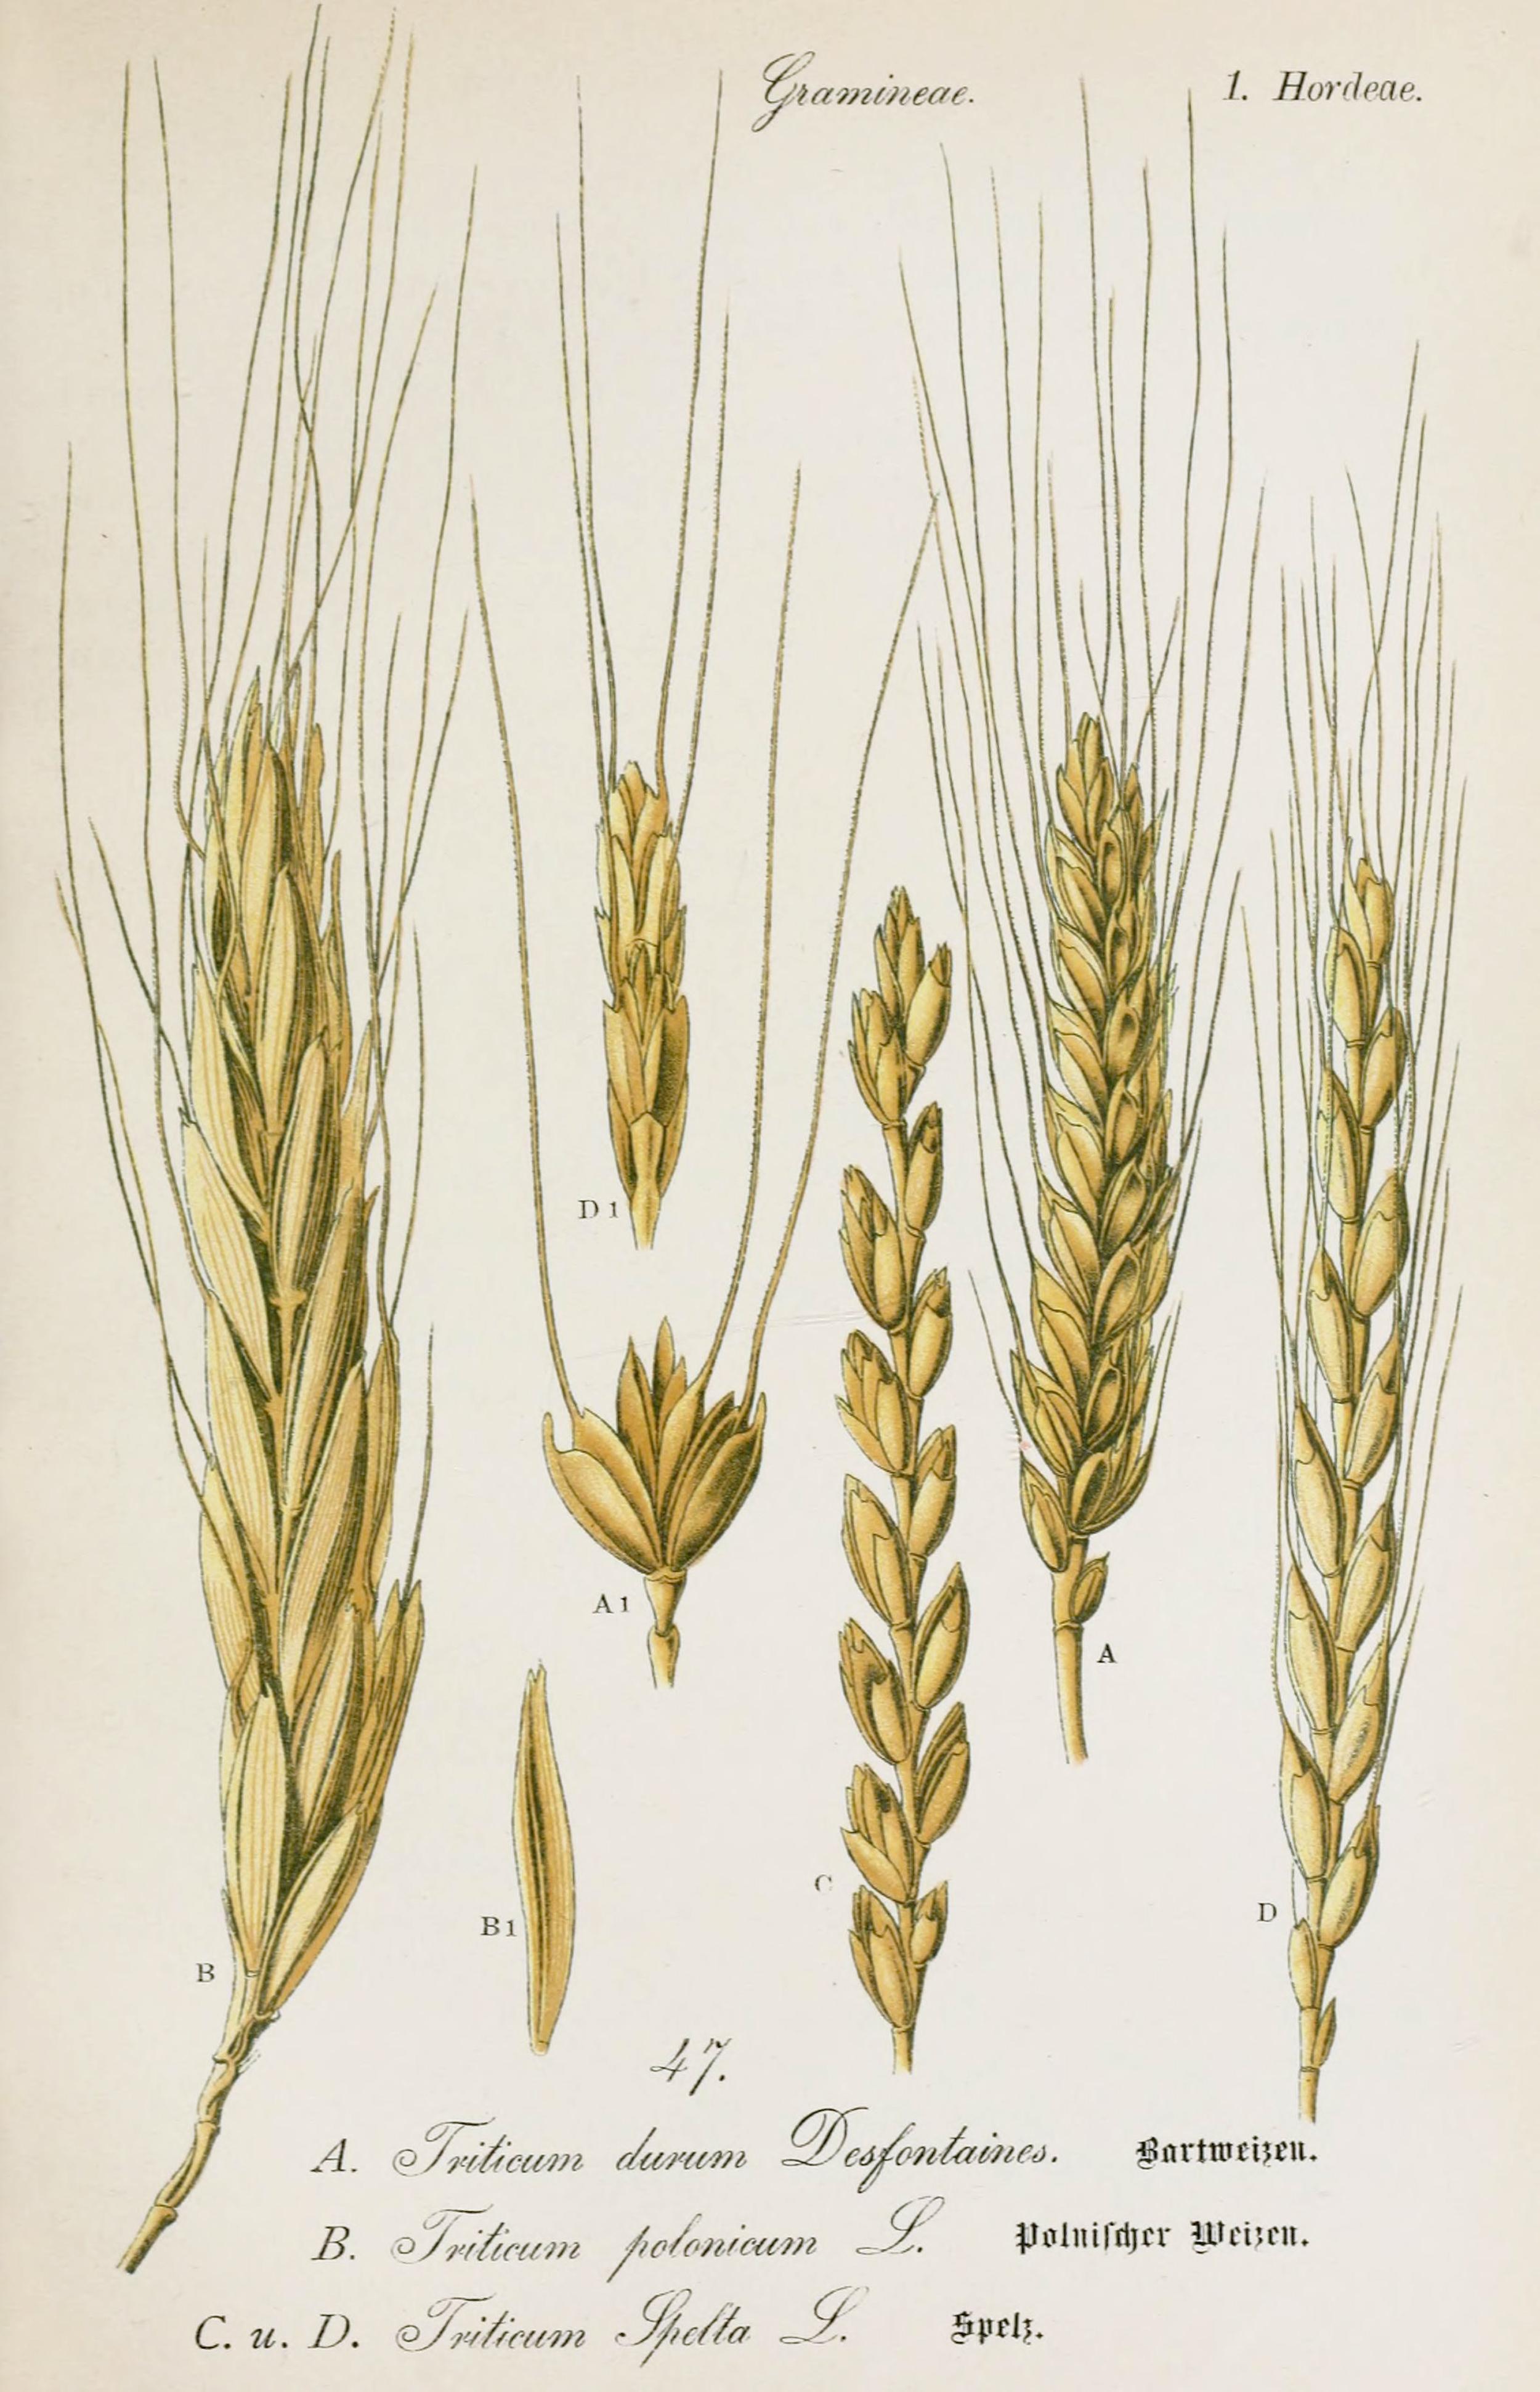 Durum Wheat Botanical Illustration from Flora of Germany circa 1903Wheat Botanical Illustration